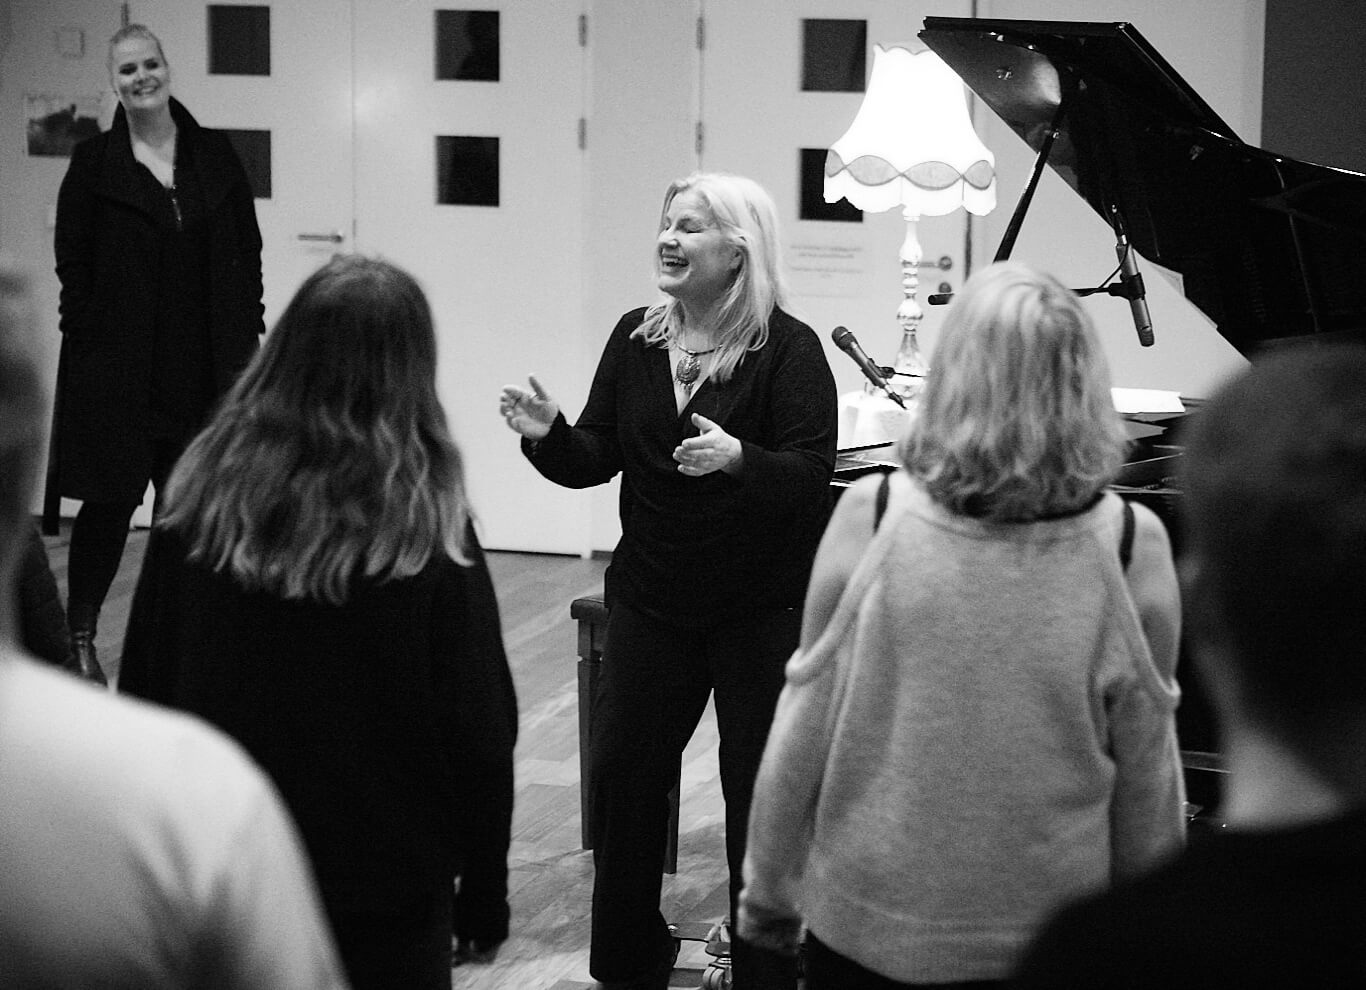 Keynote talk by Kara Johnstad: Activating the Voice Vortex Energy